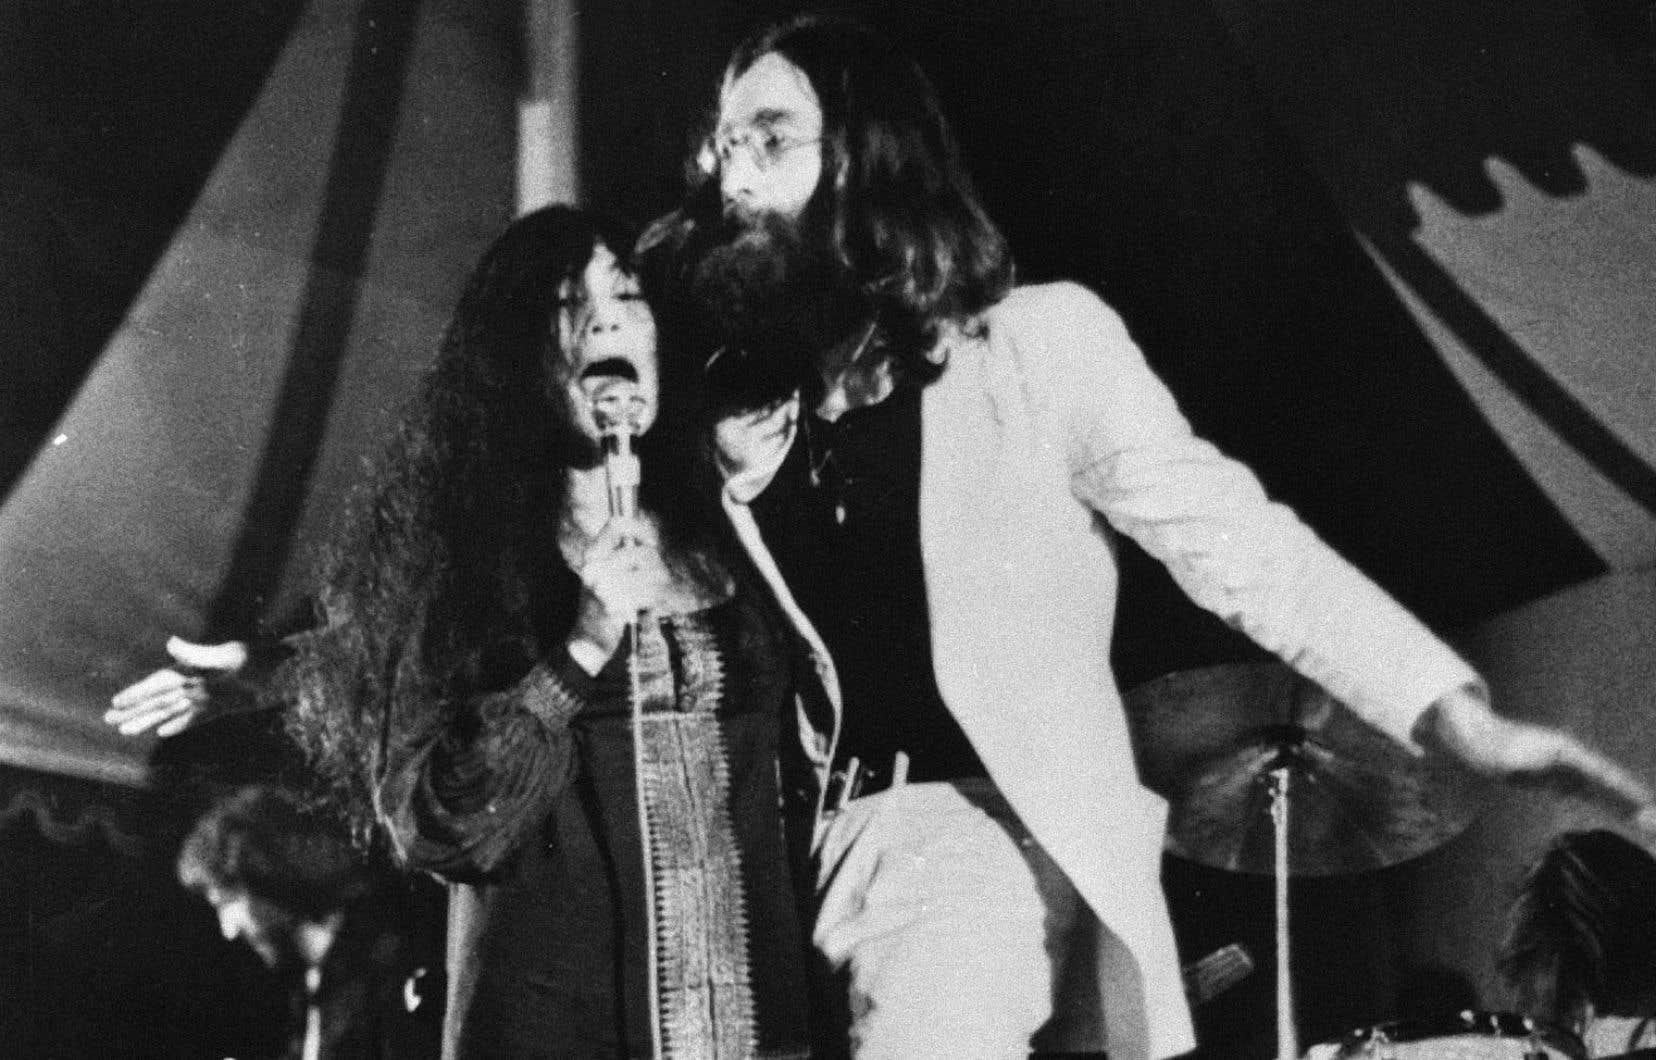 John Lennon et Yoko Ono à Toronto en 1969